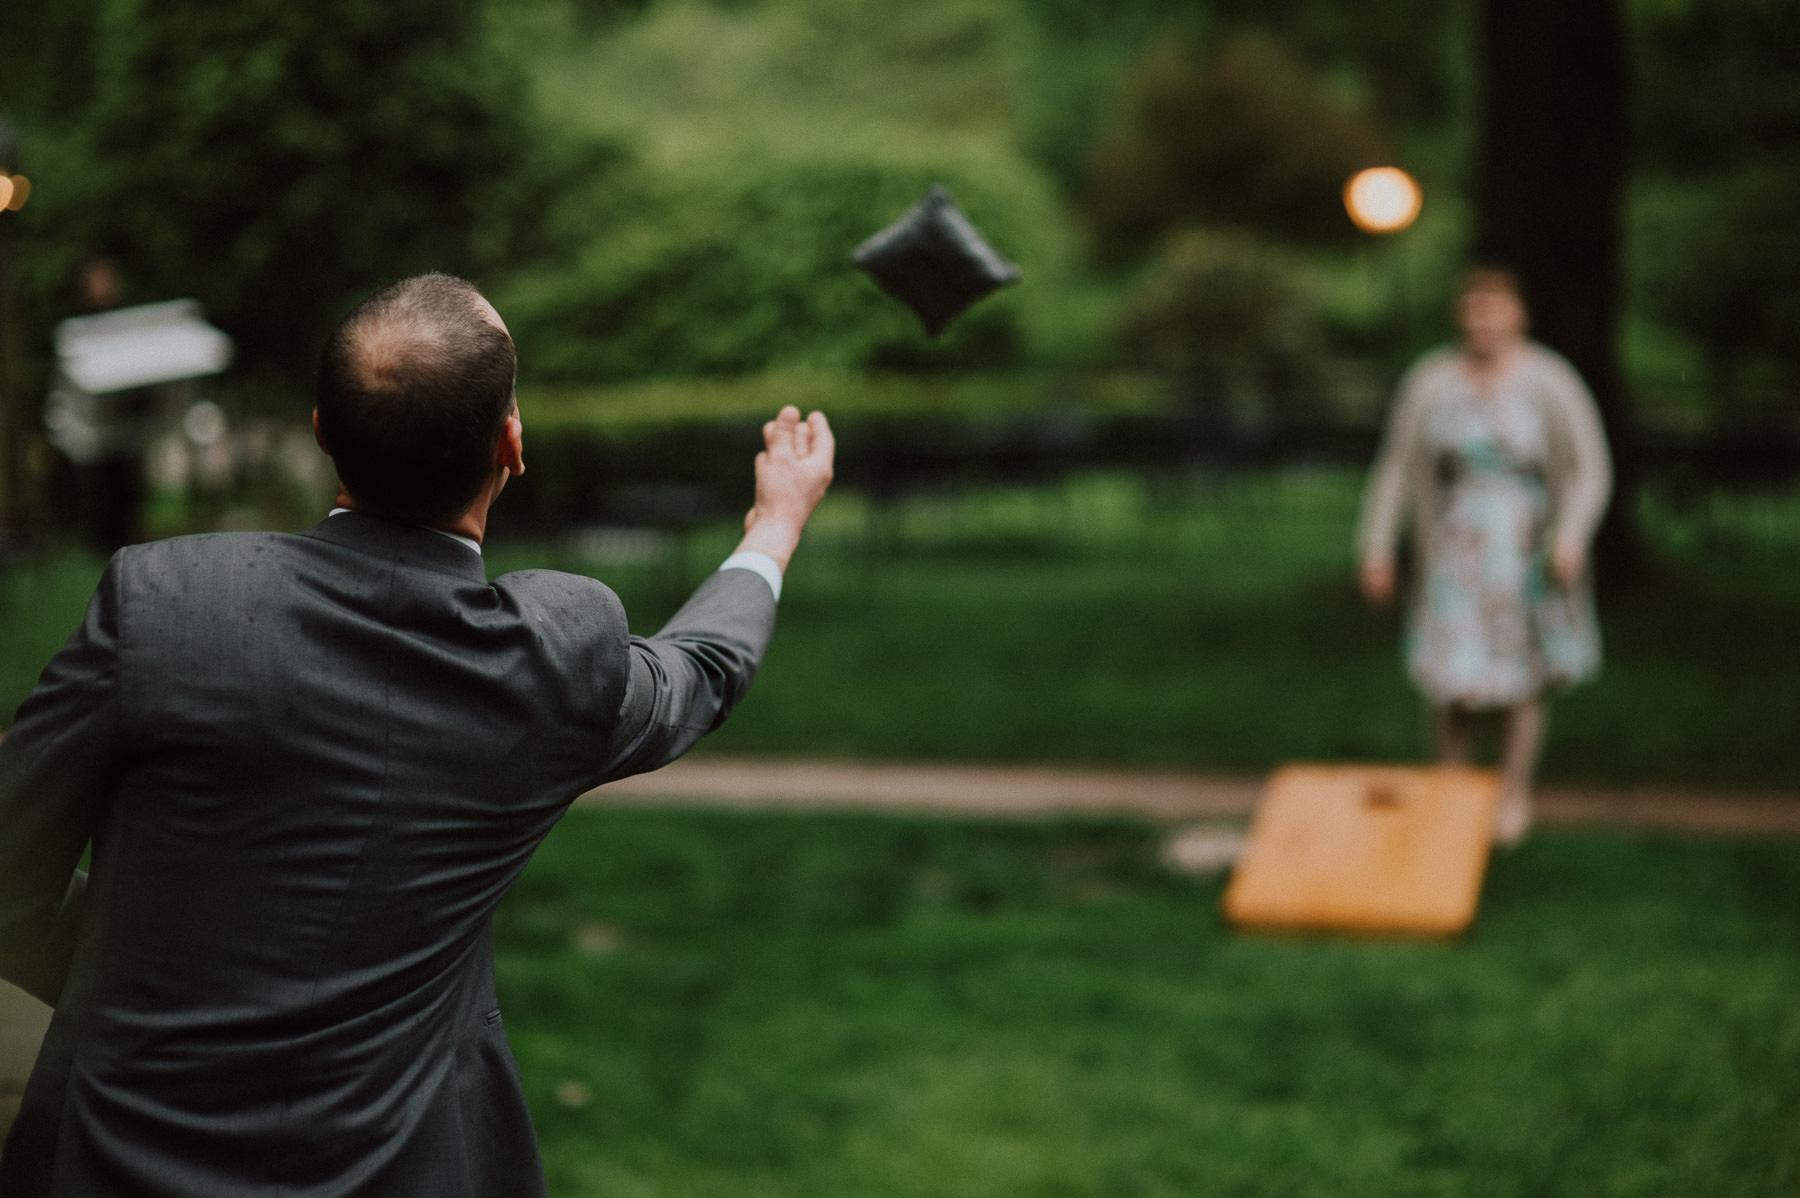 appleford-estate-wedding-photography-80.jpg